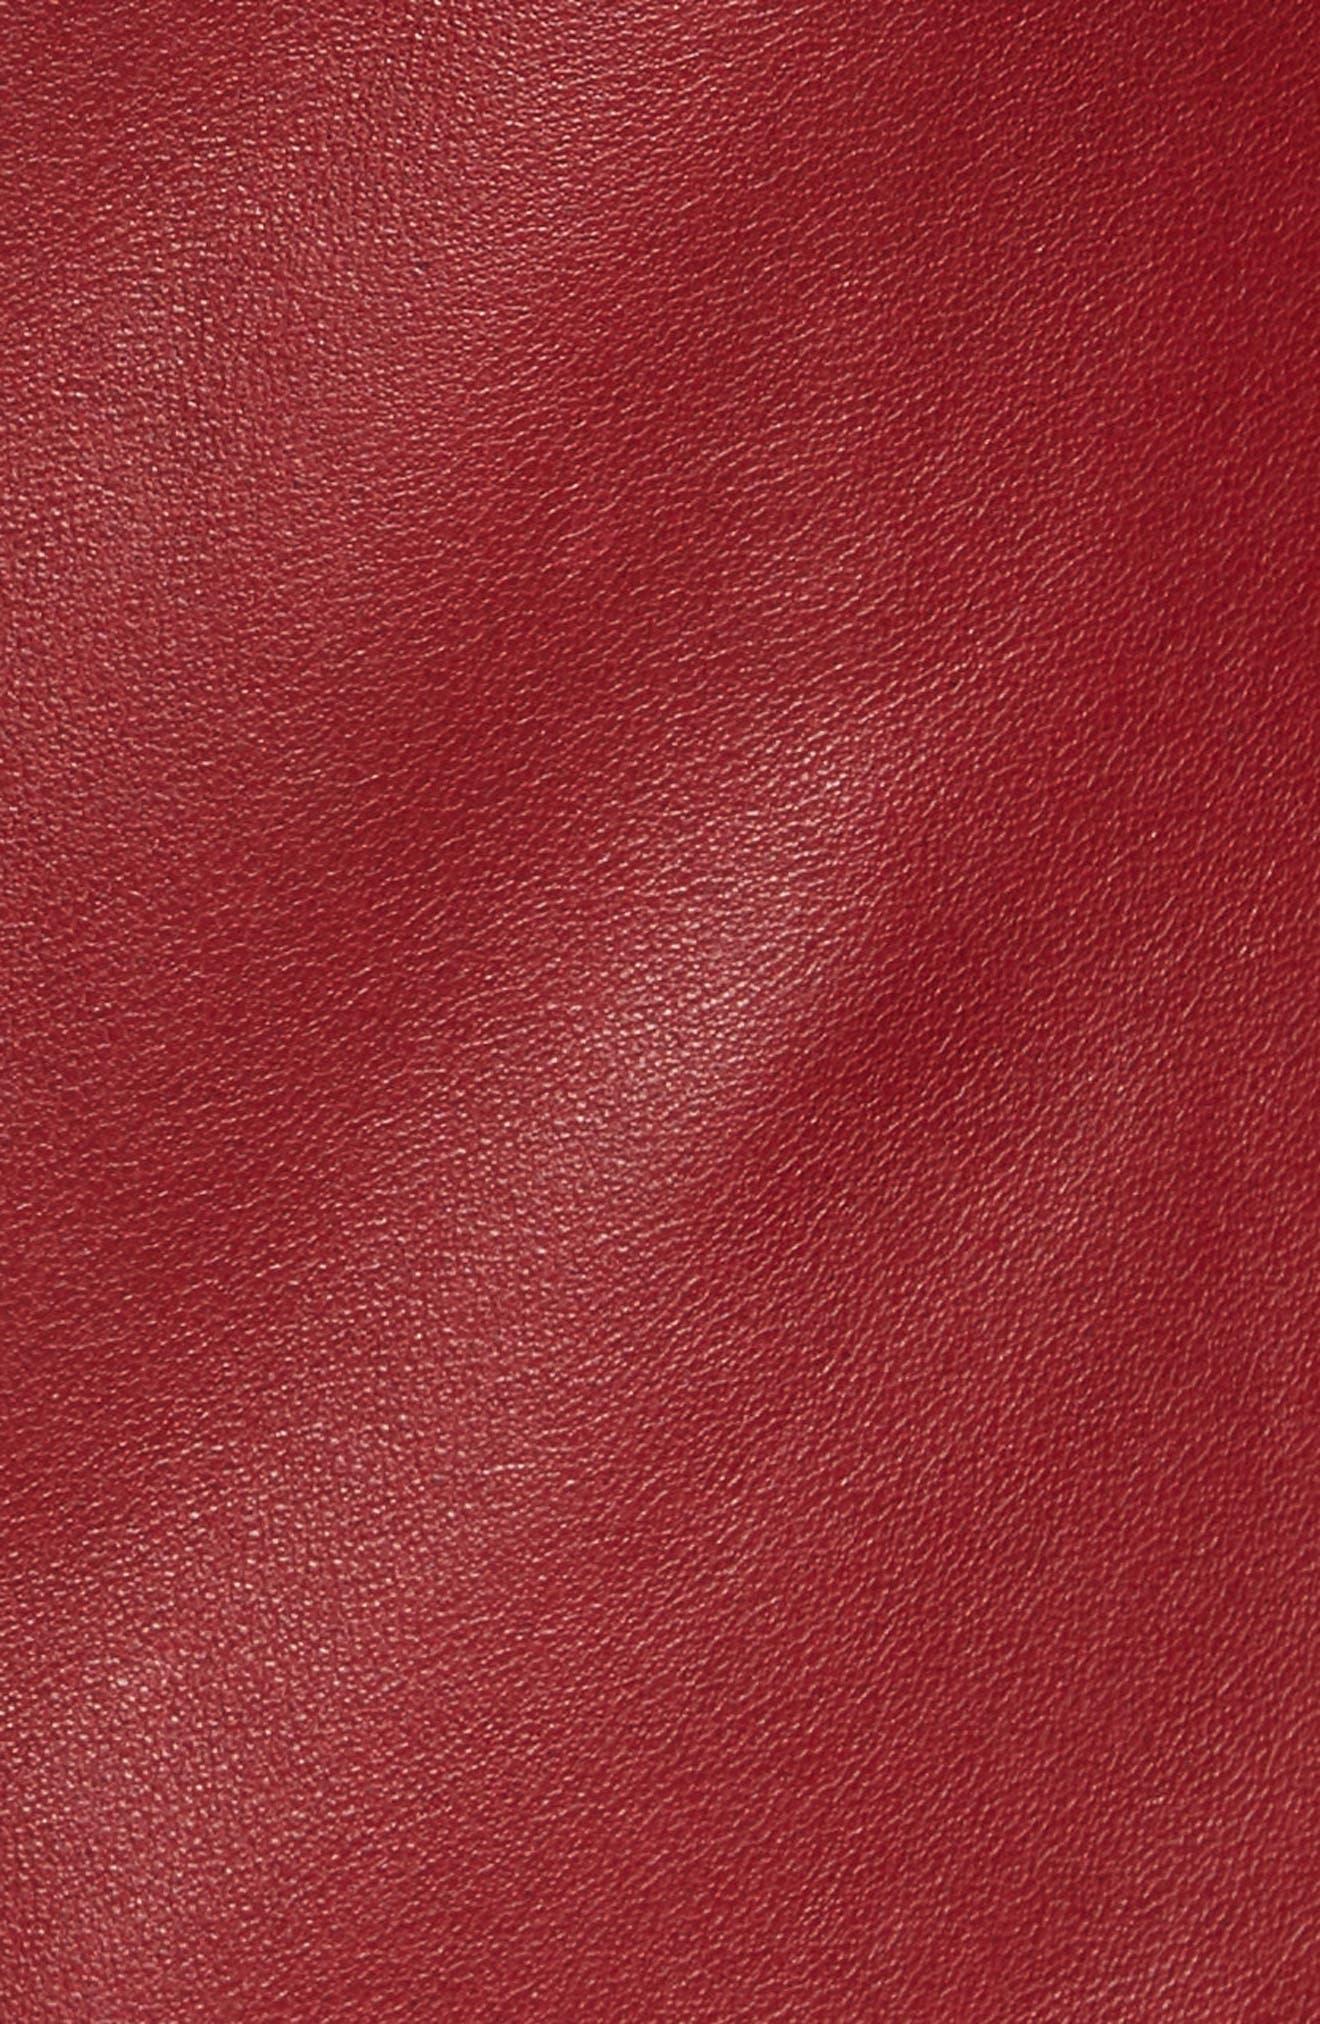 Lambskin Leather Scuba Jacket,                             Alternate thumbnail 7, color,                             RED